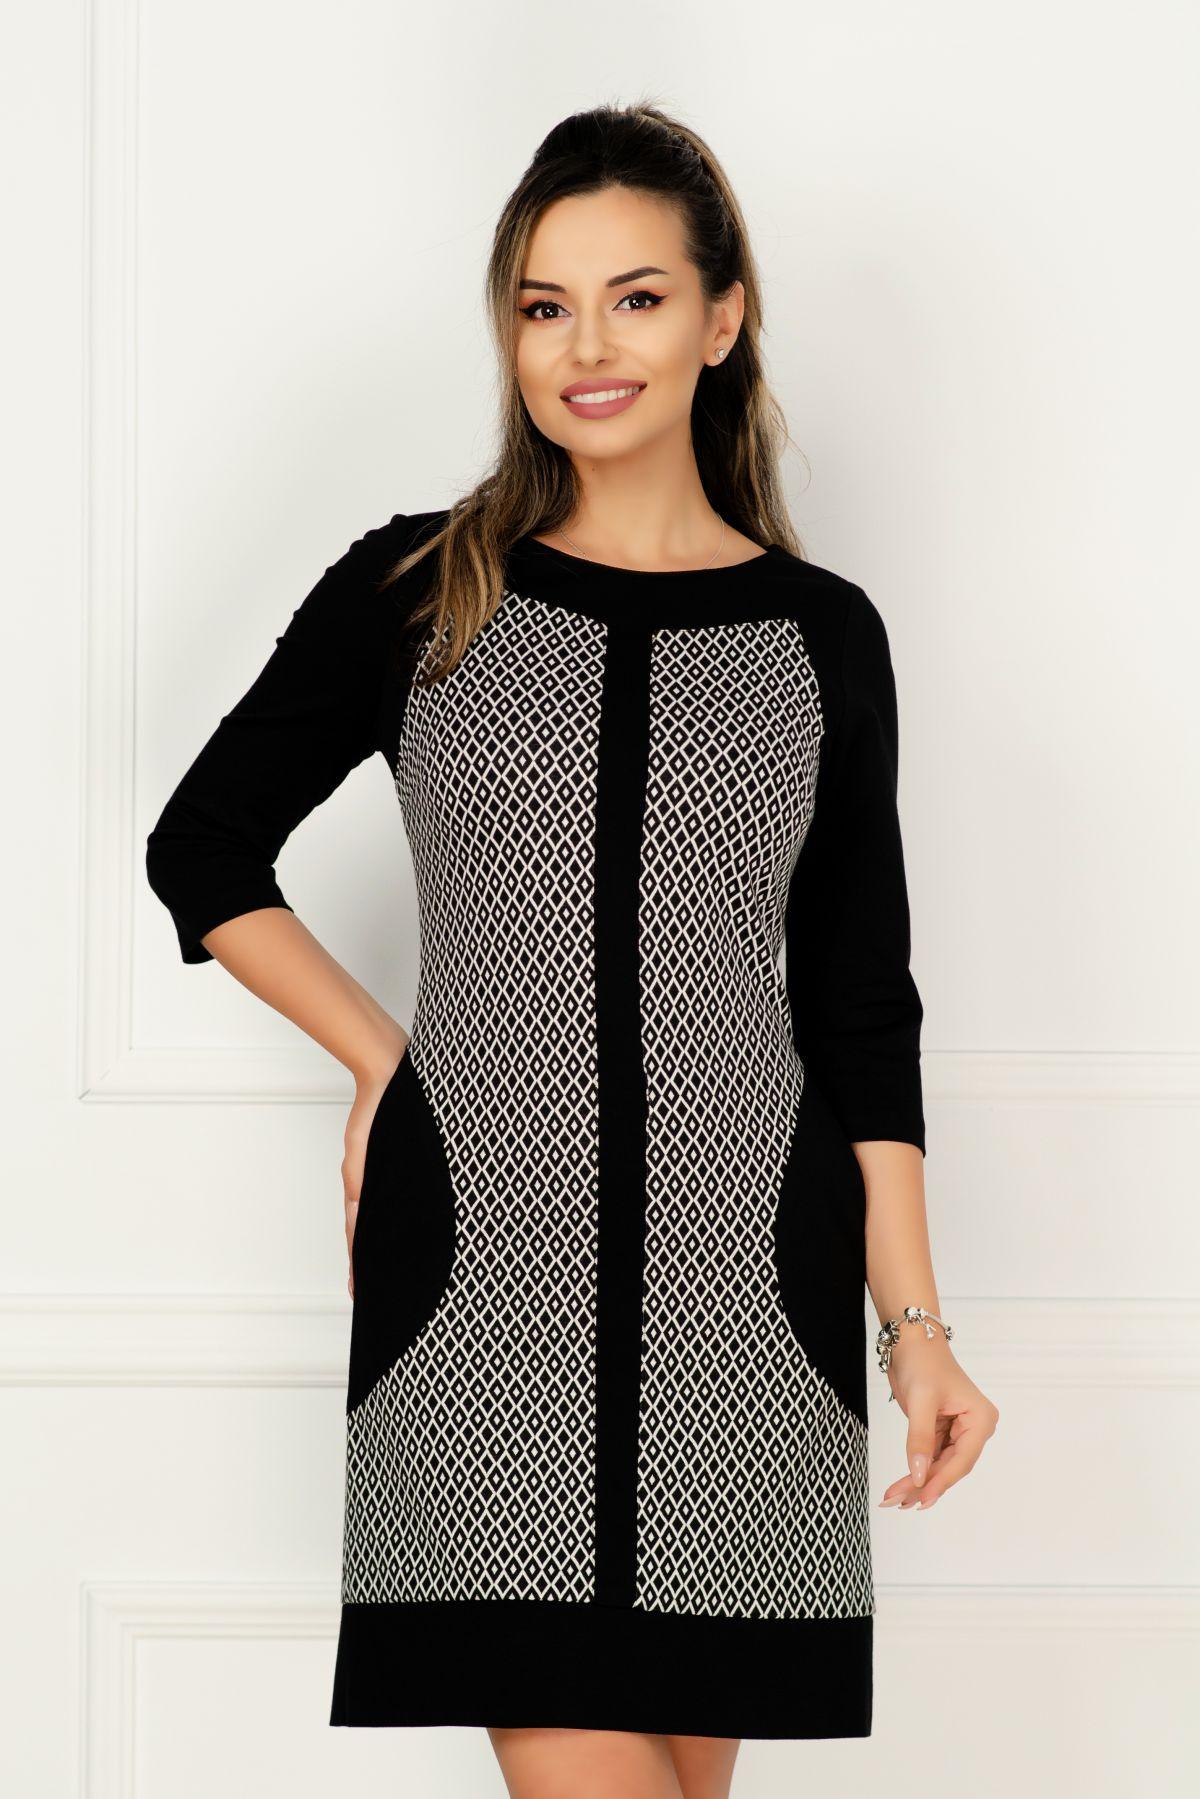 Rochie MBG de zi din tricot cu imprimeu romburi si buzunare laterale MBG-Collection